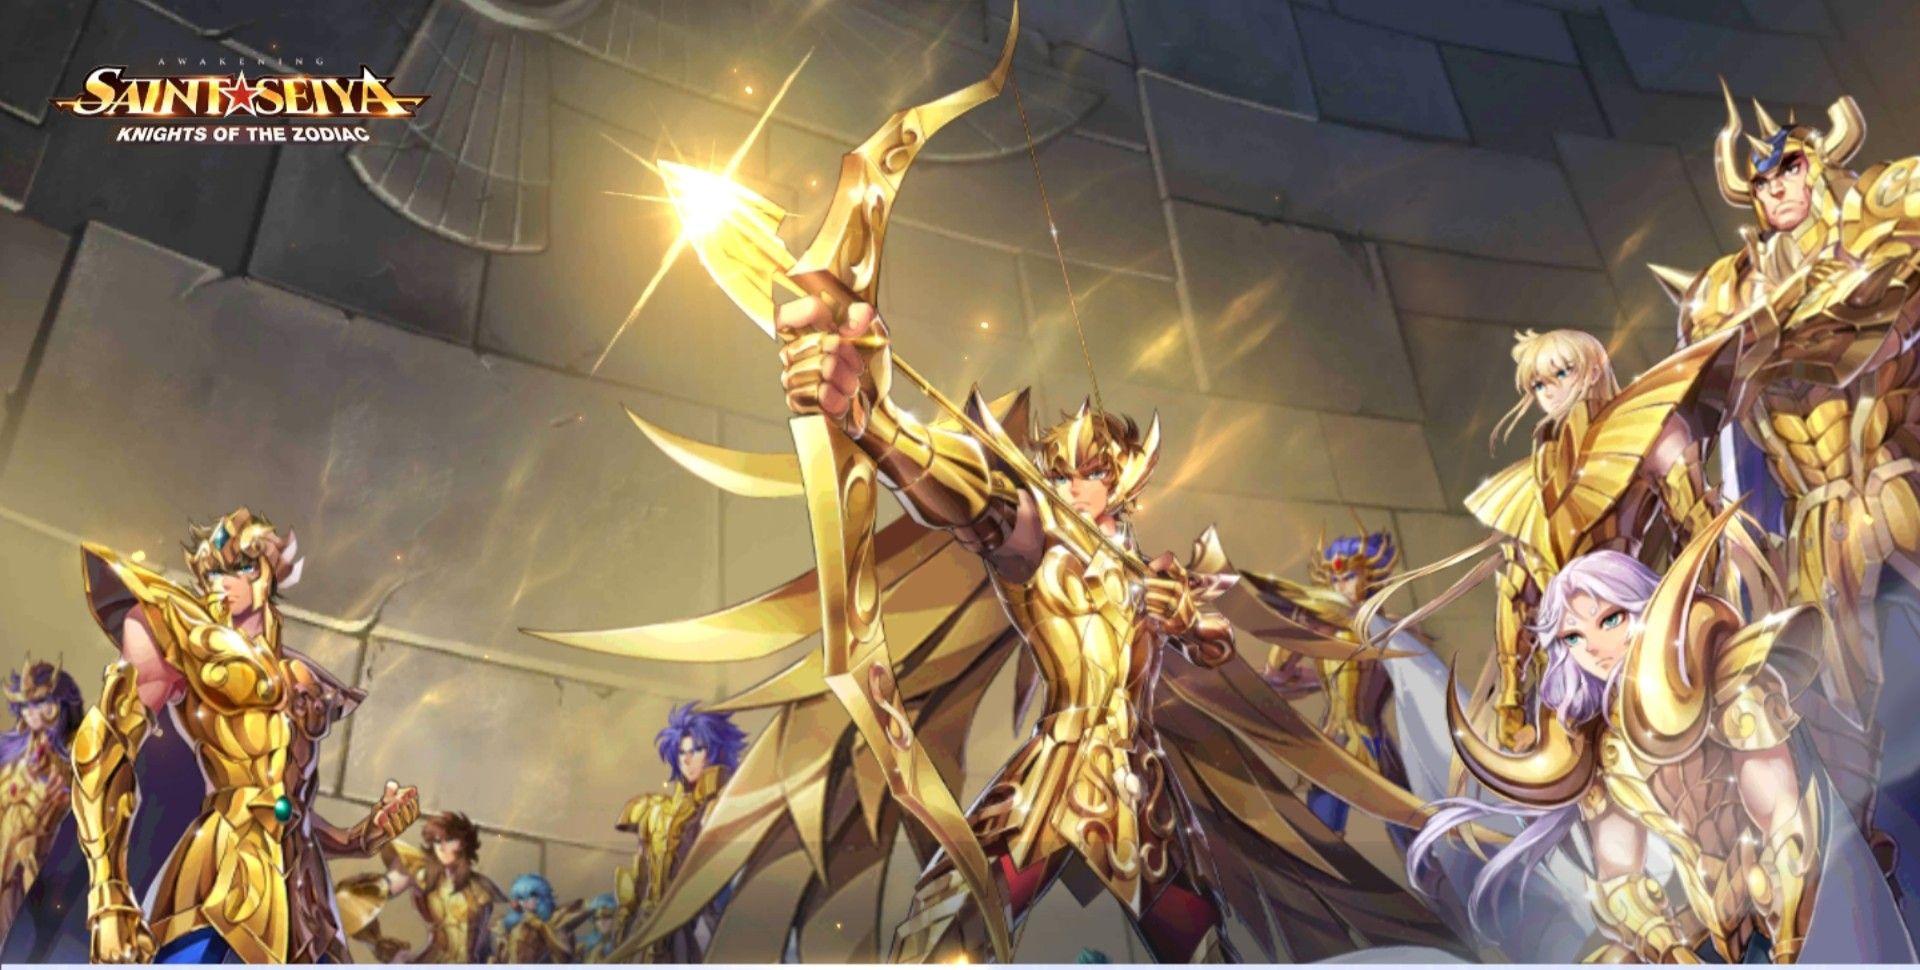 Pin En Saint Seiya Awakening Knights Of The Zodiac